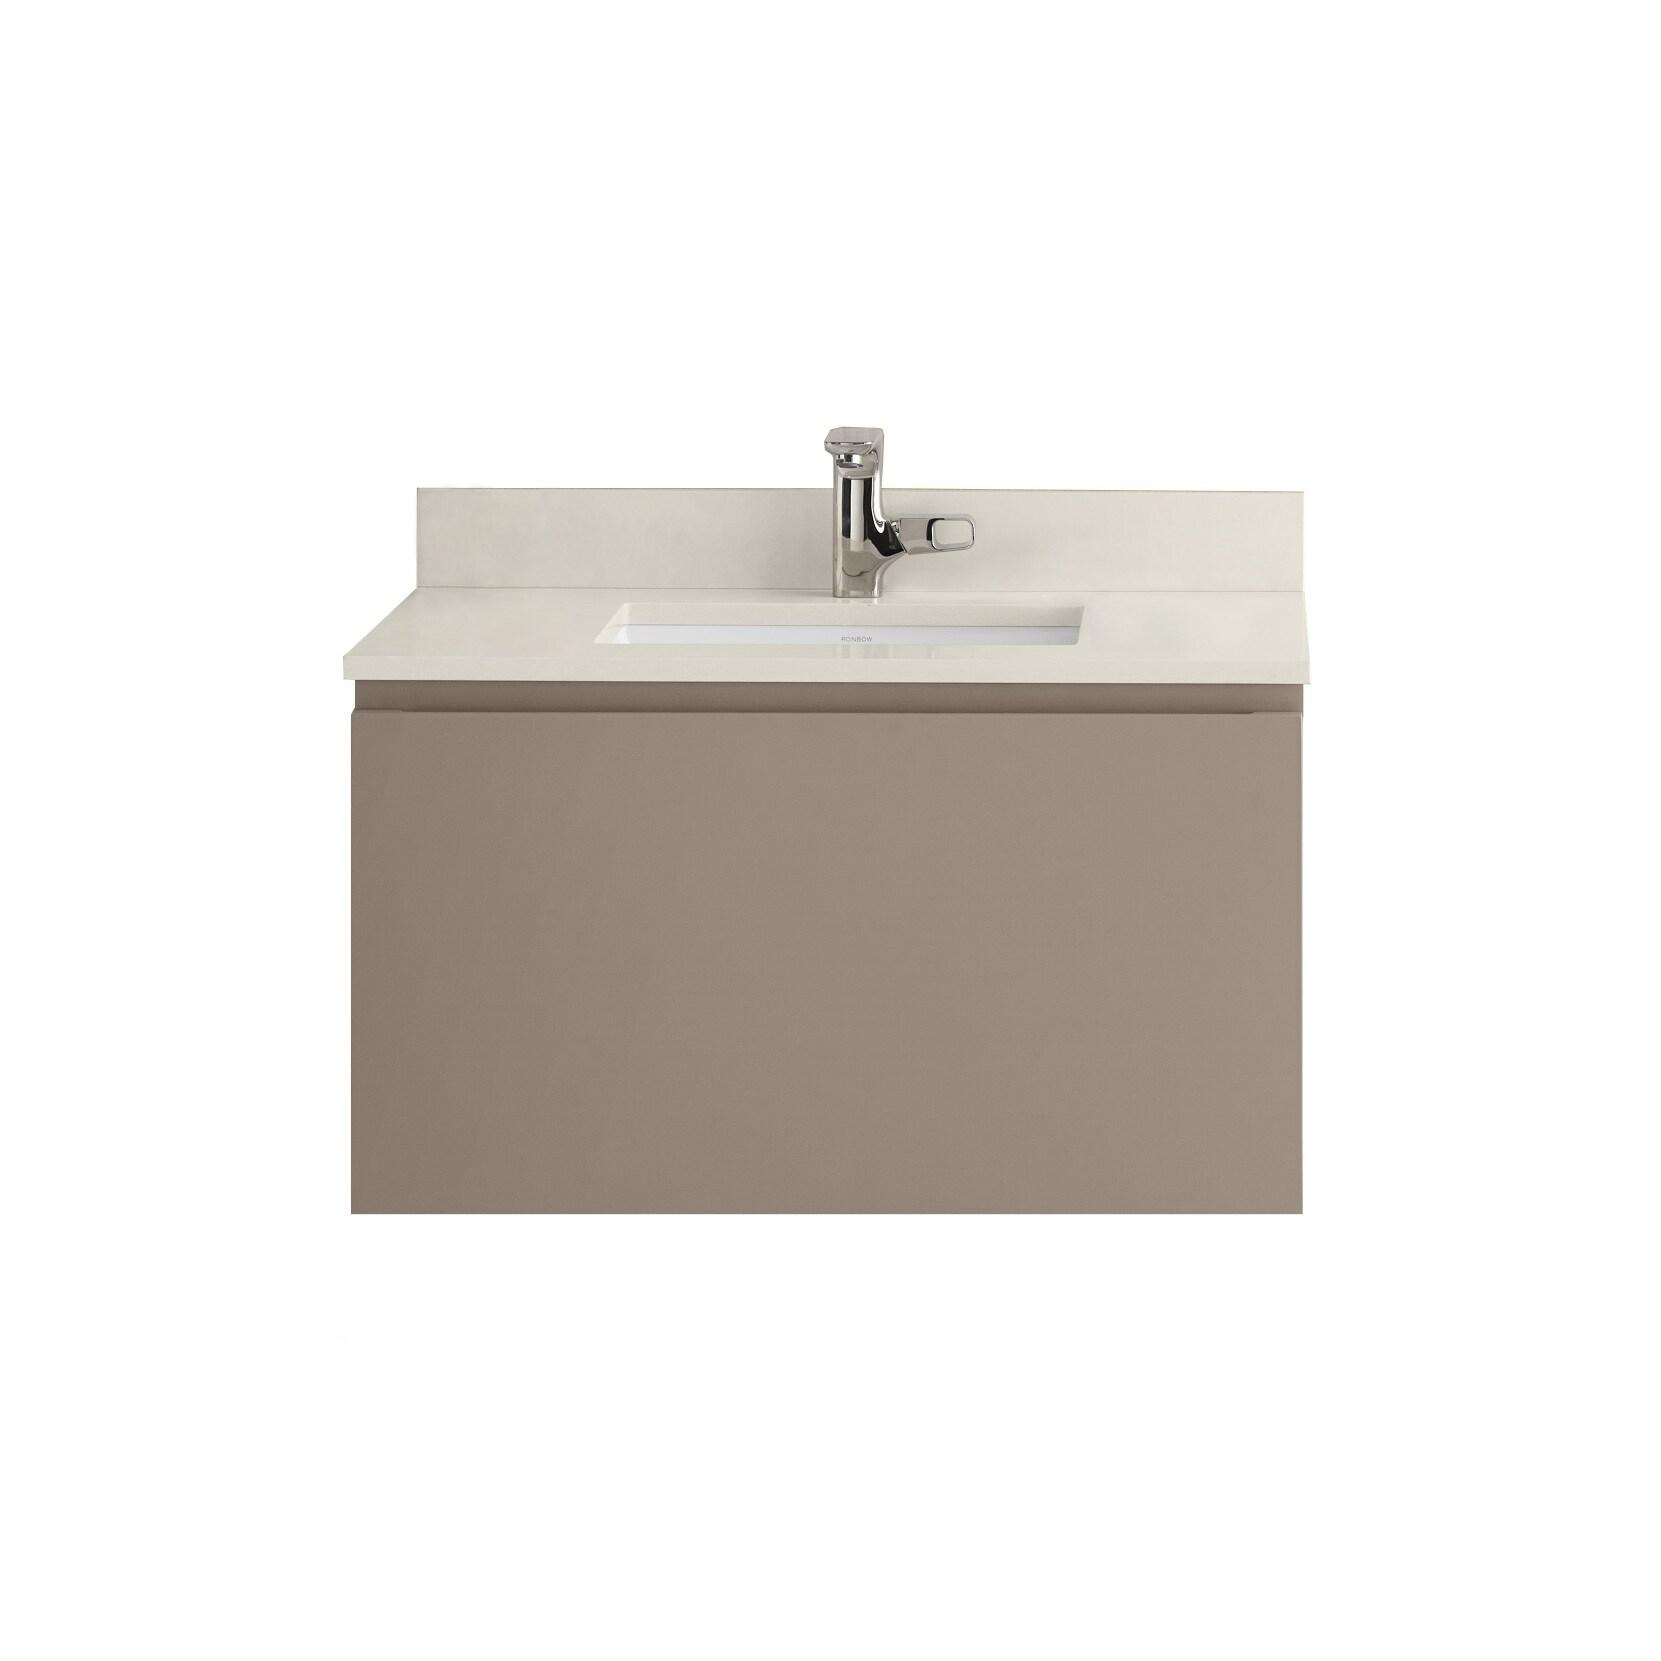 Shop ronbow ariella grey wood ceramic 32 inch bathroom vanity set free shipping today overstock com 15974824